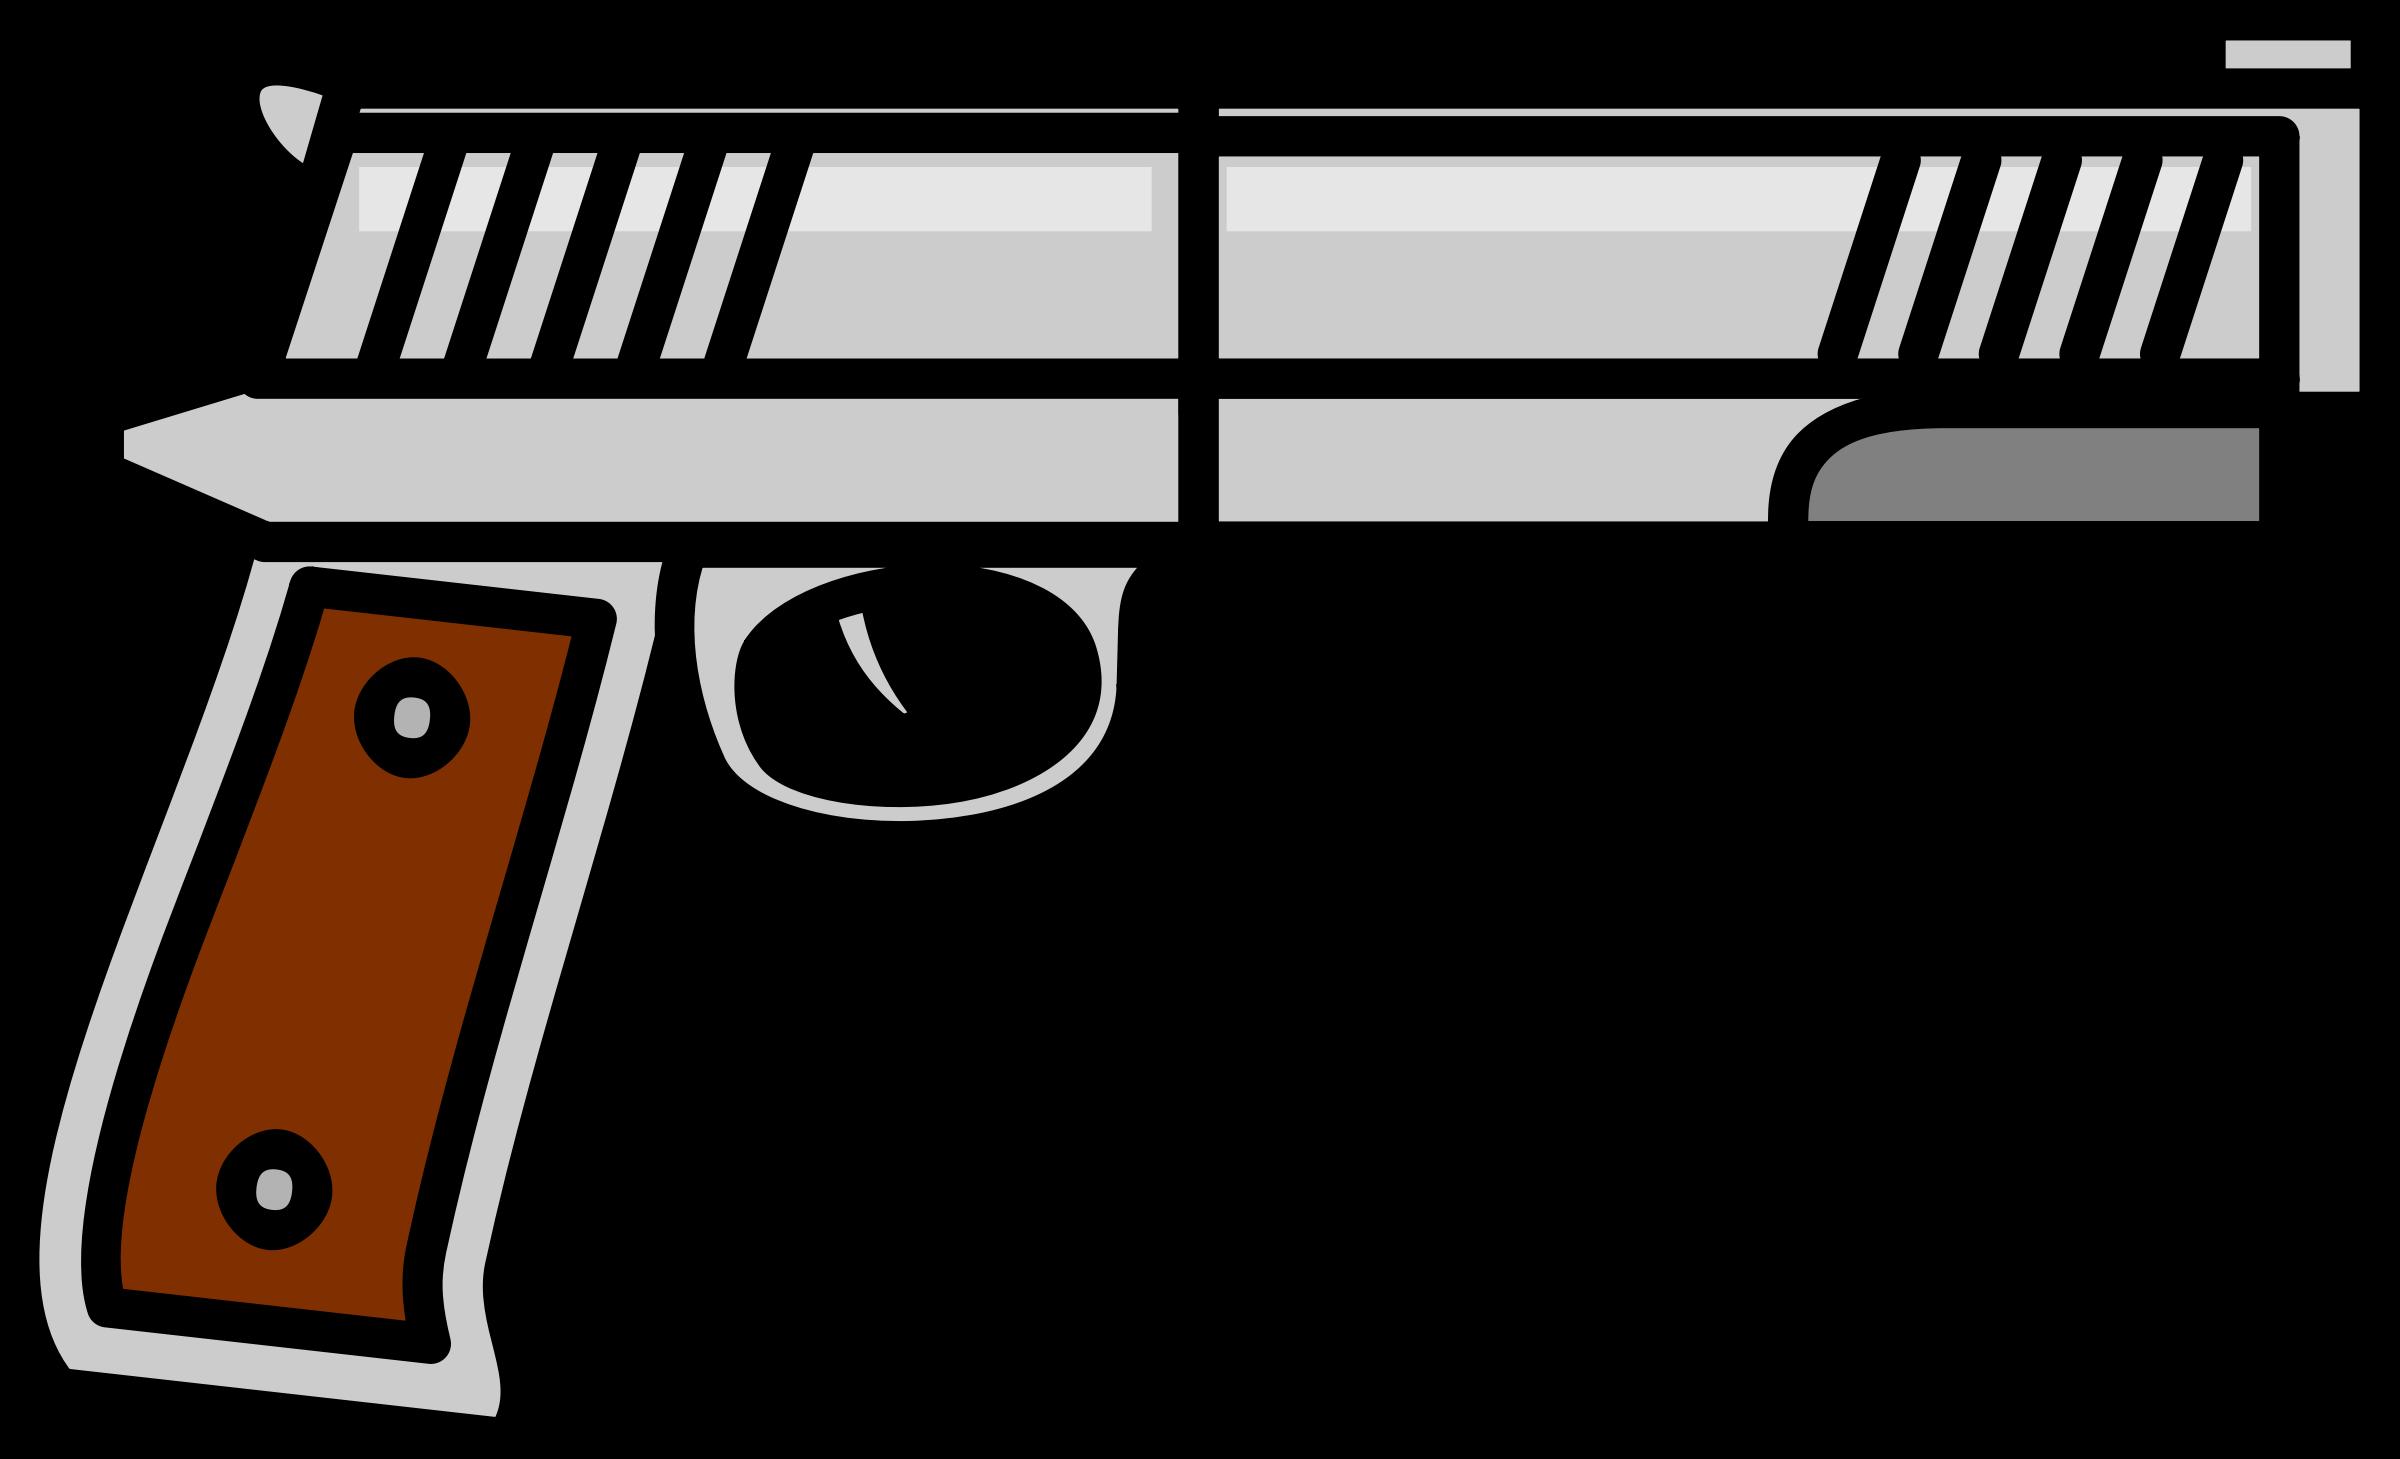 clipart guns pictures - photo #39